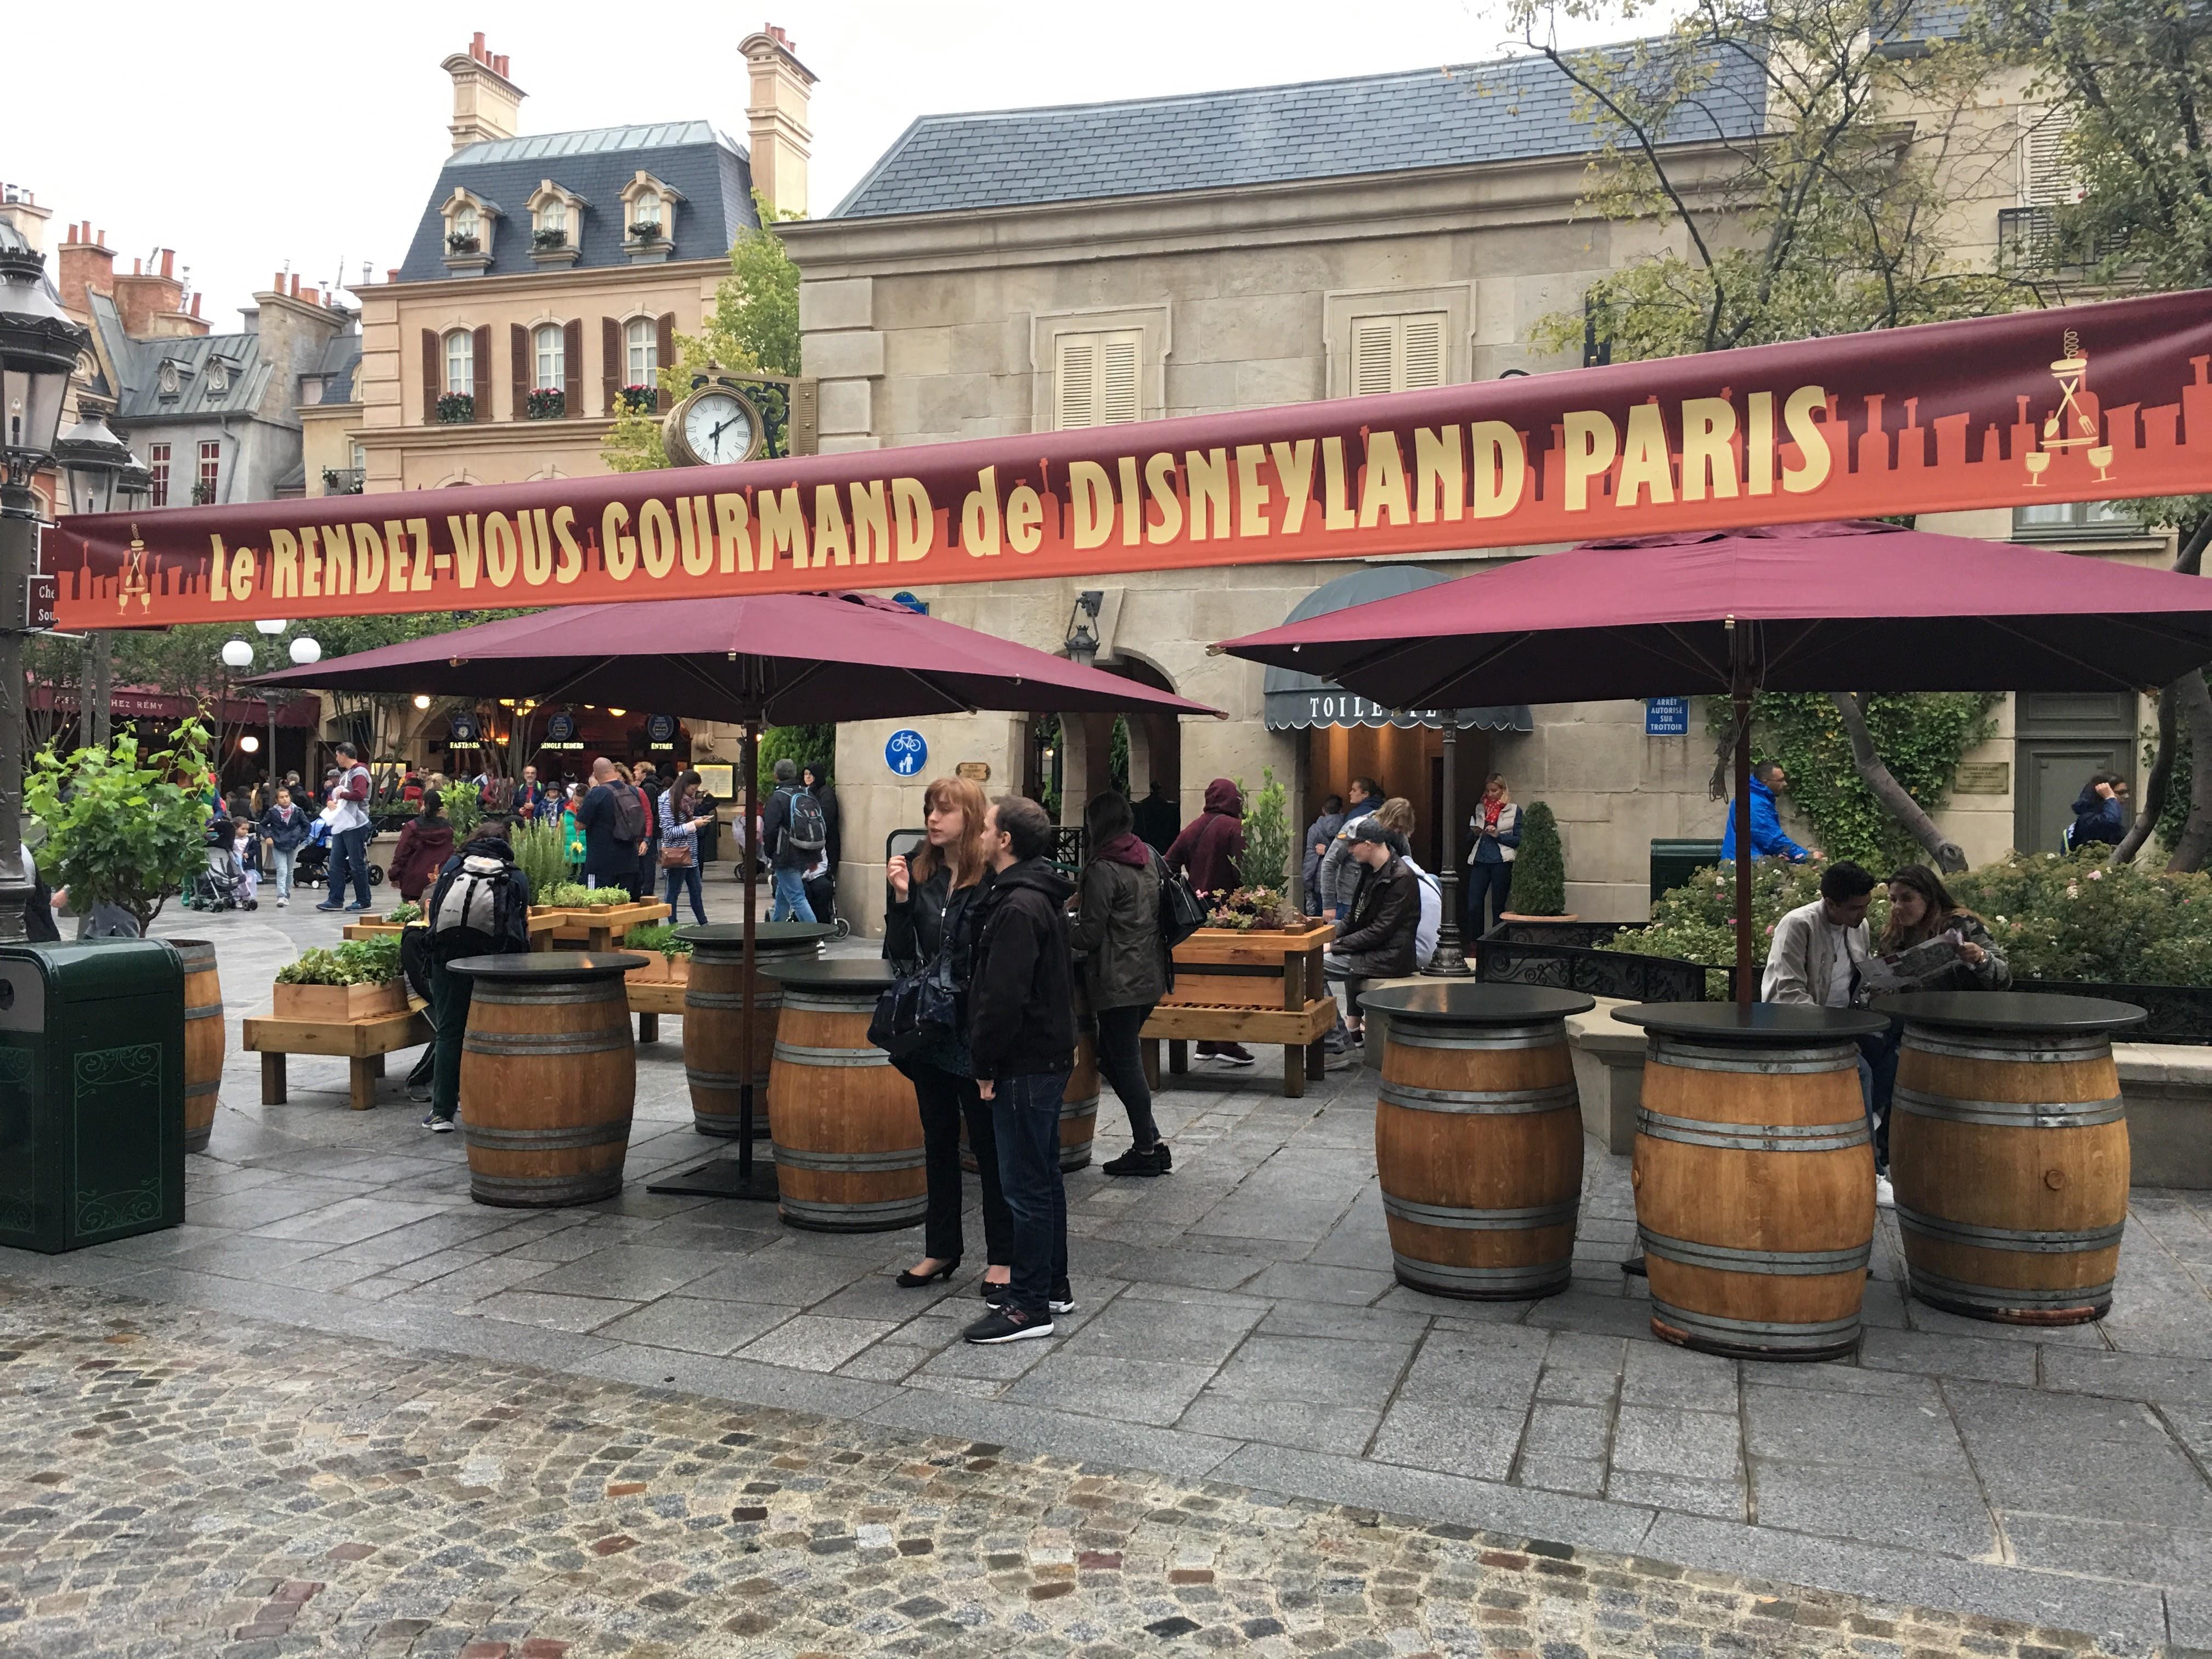 Disneyland Paris - Food Festival 2017 - chez marianne